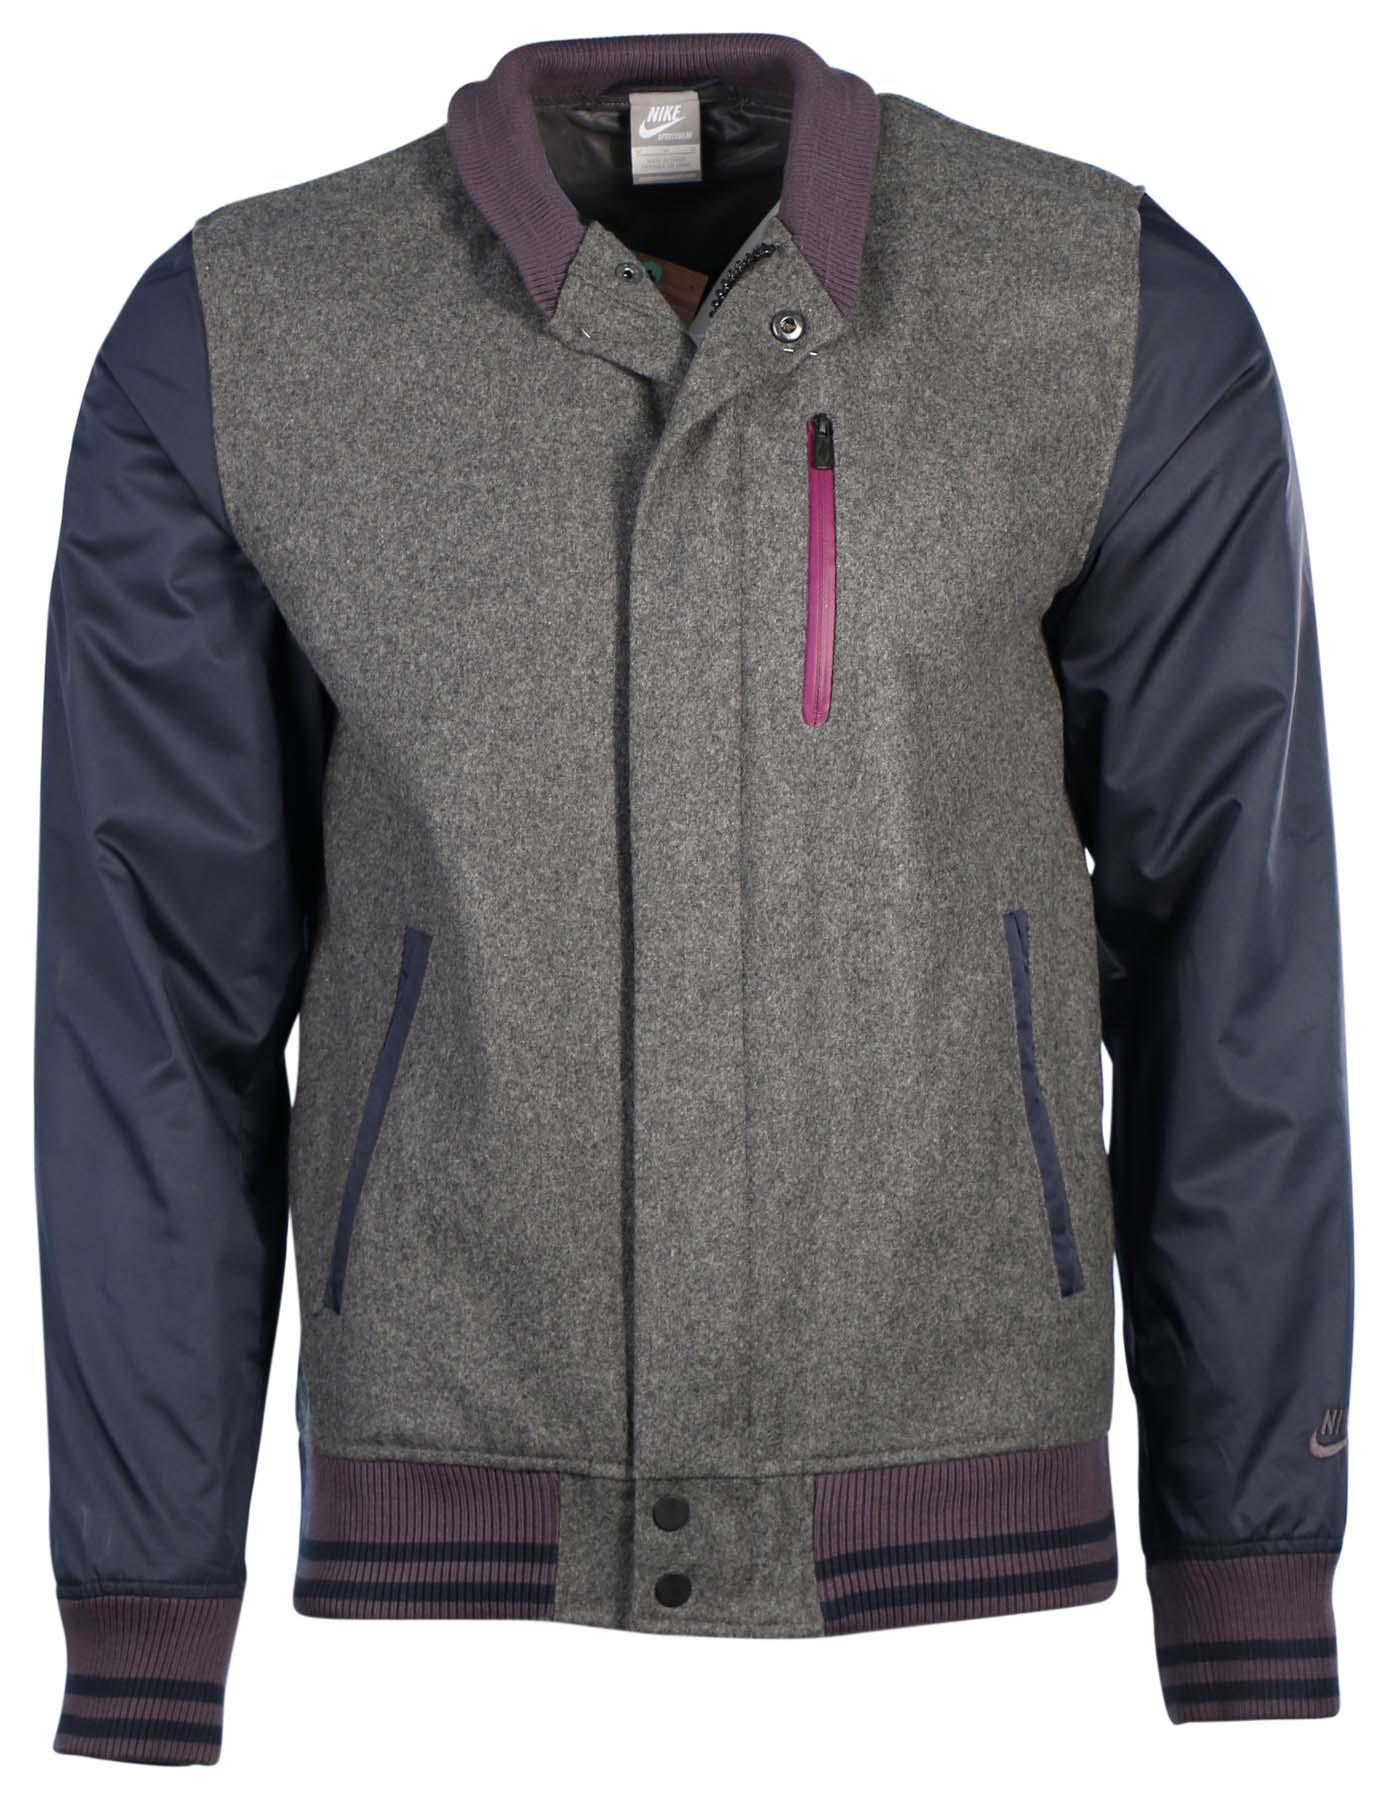 Nike jacket gray and black - Nike Men 039 S Destroyer Tech Wool Training